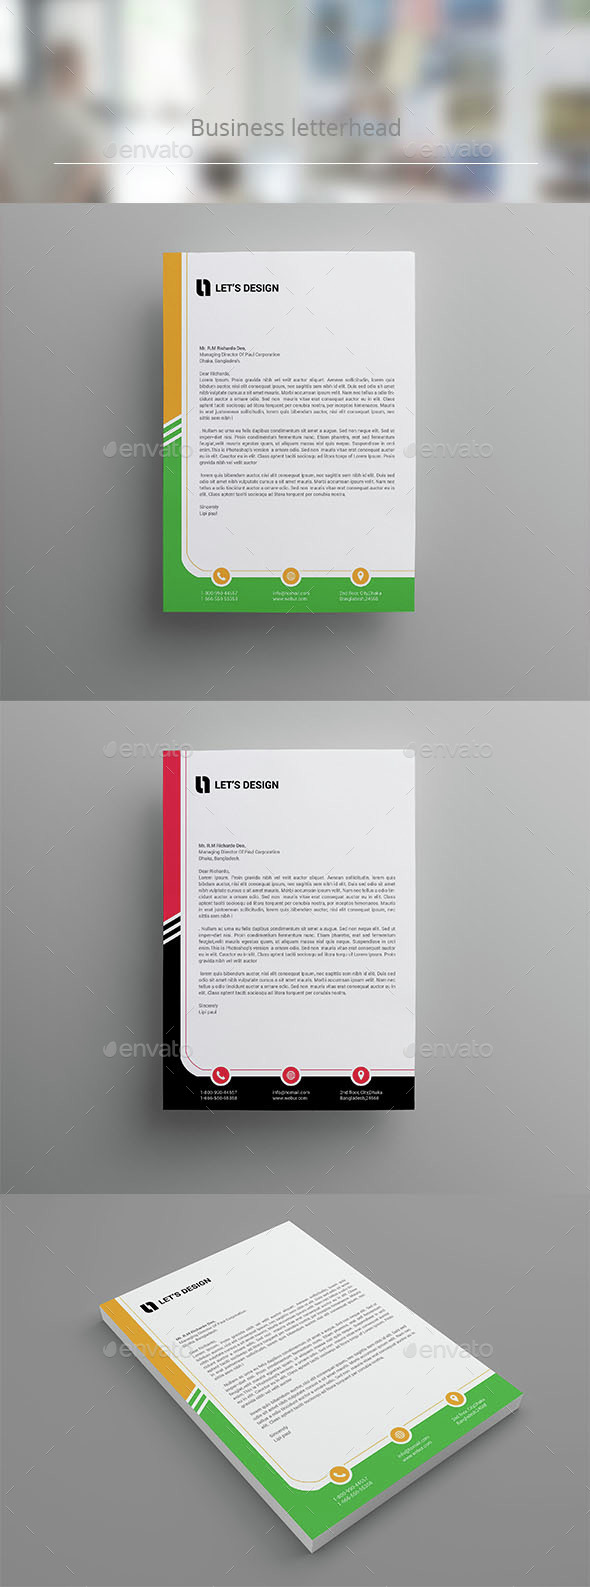 Business Letterhead-20